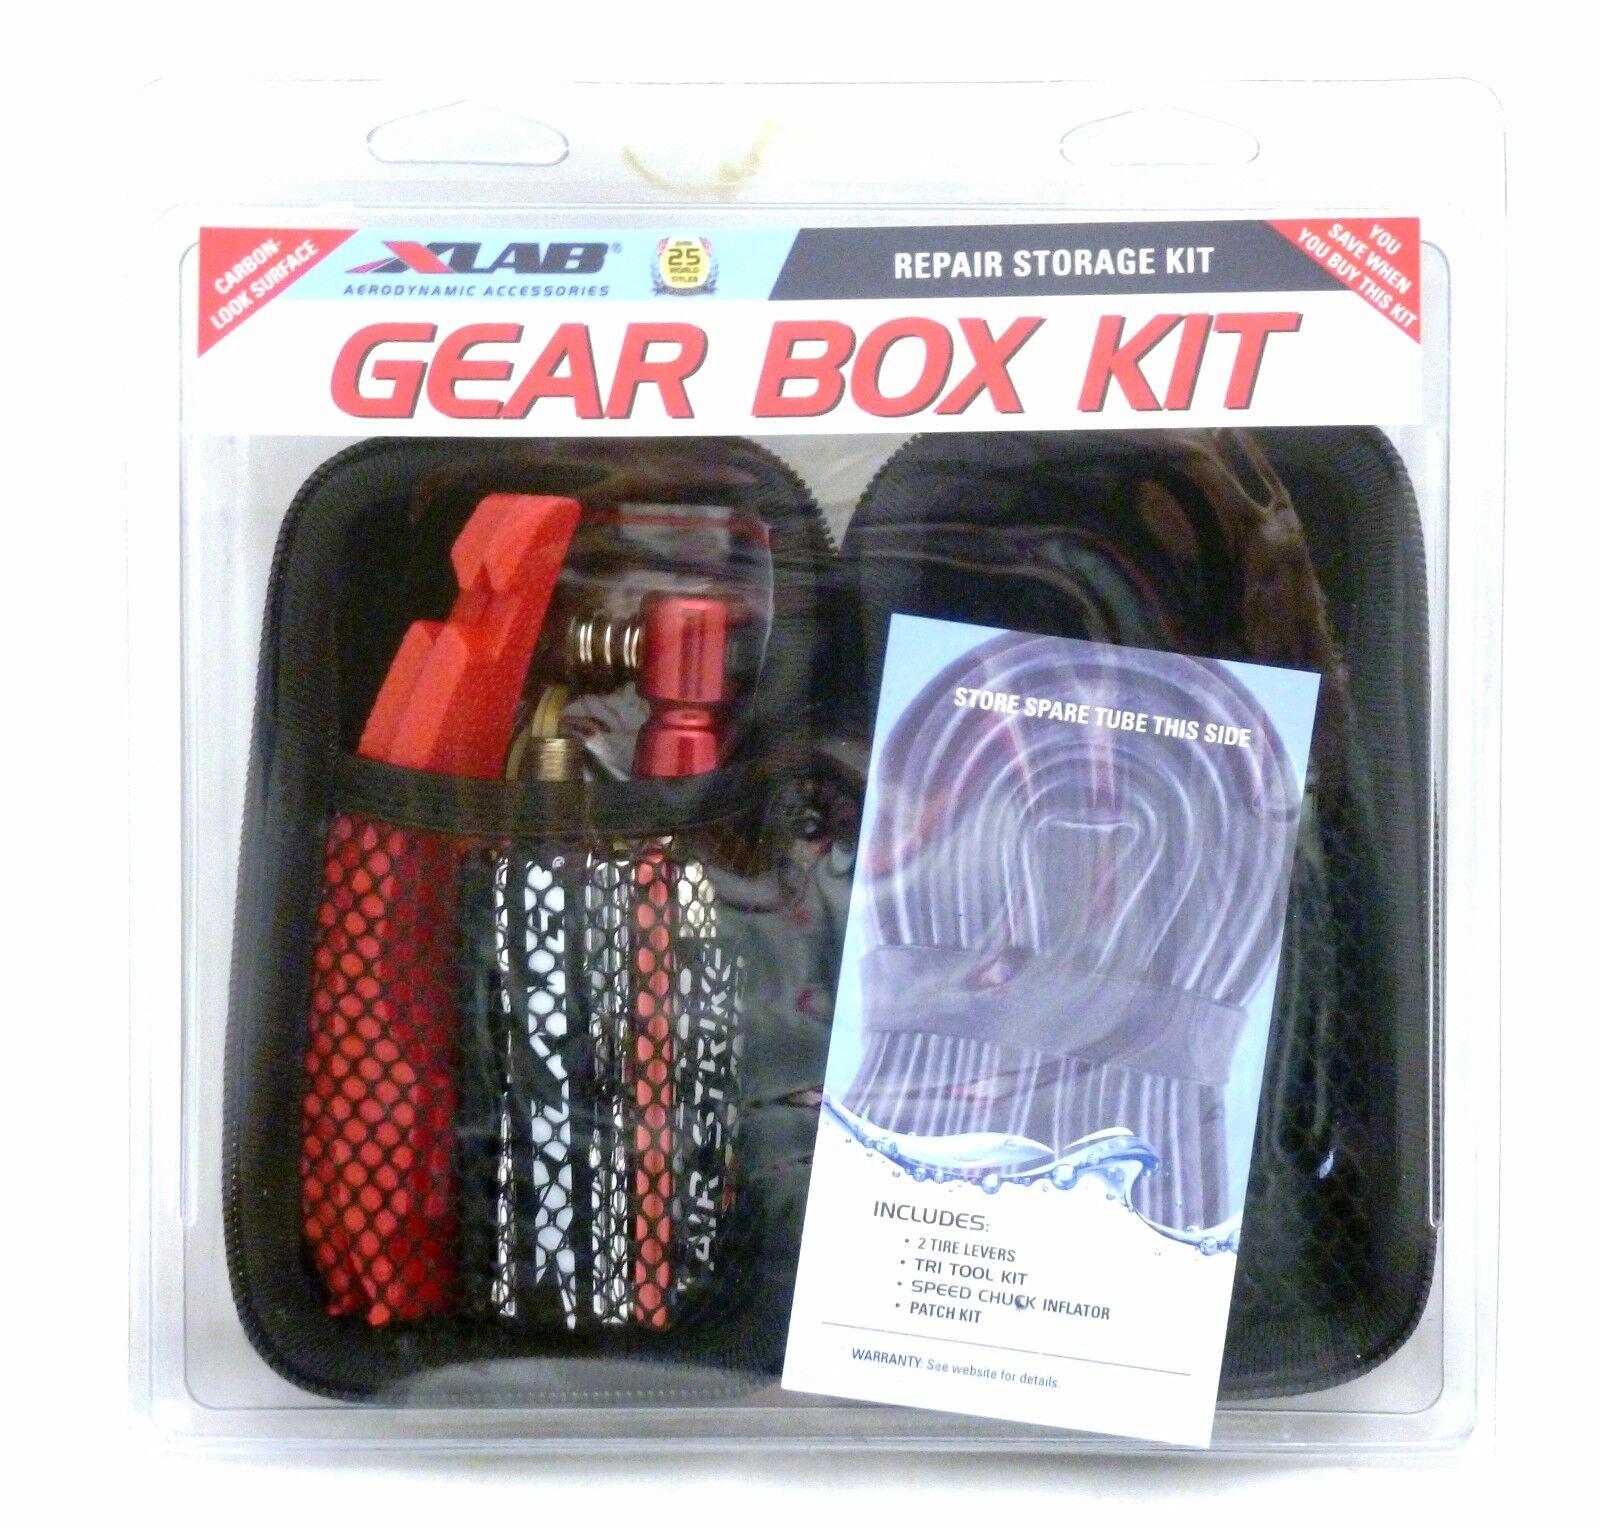 Xlab Gear Box Kit Repair Storage Kit for Bicycles X-Lab